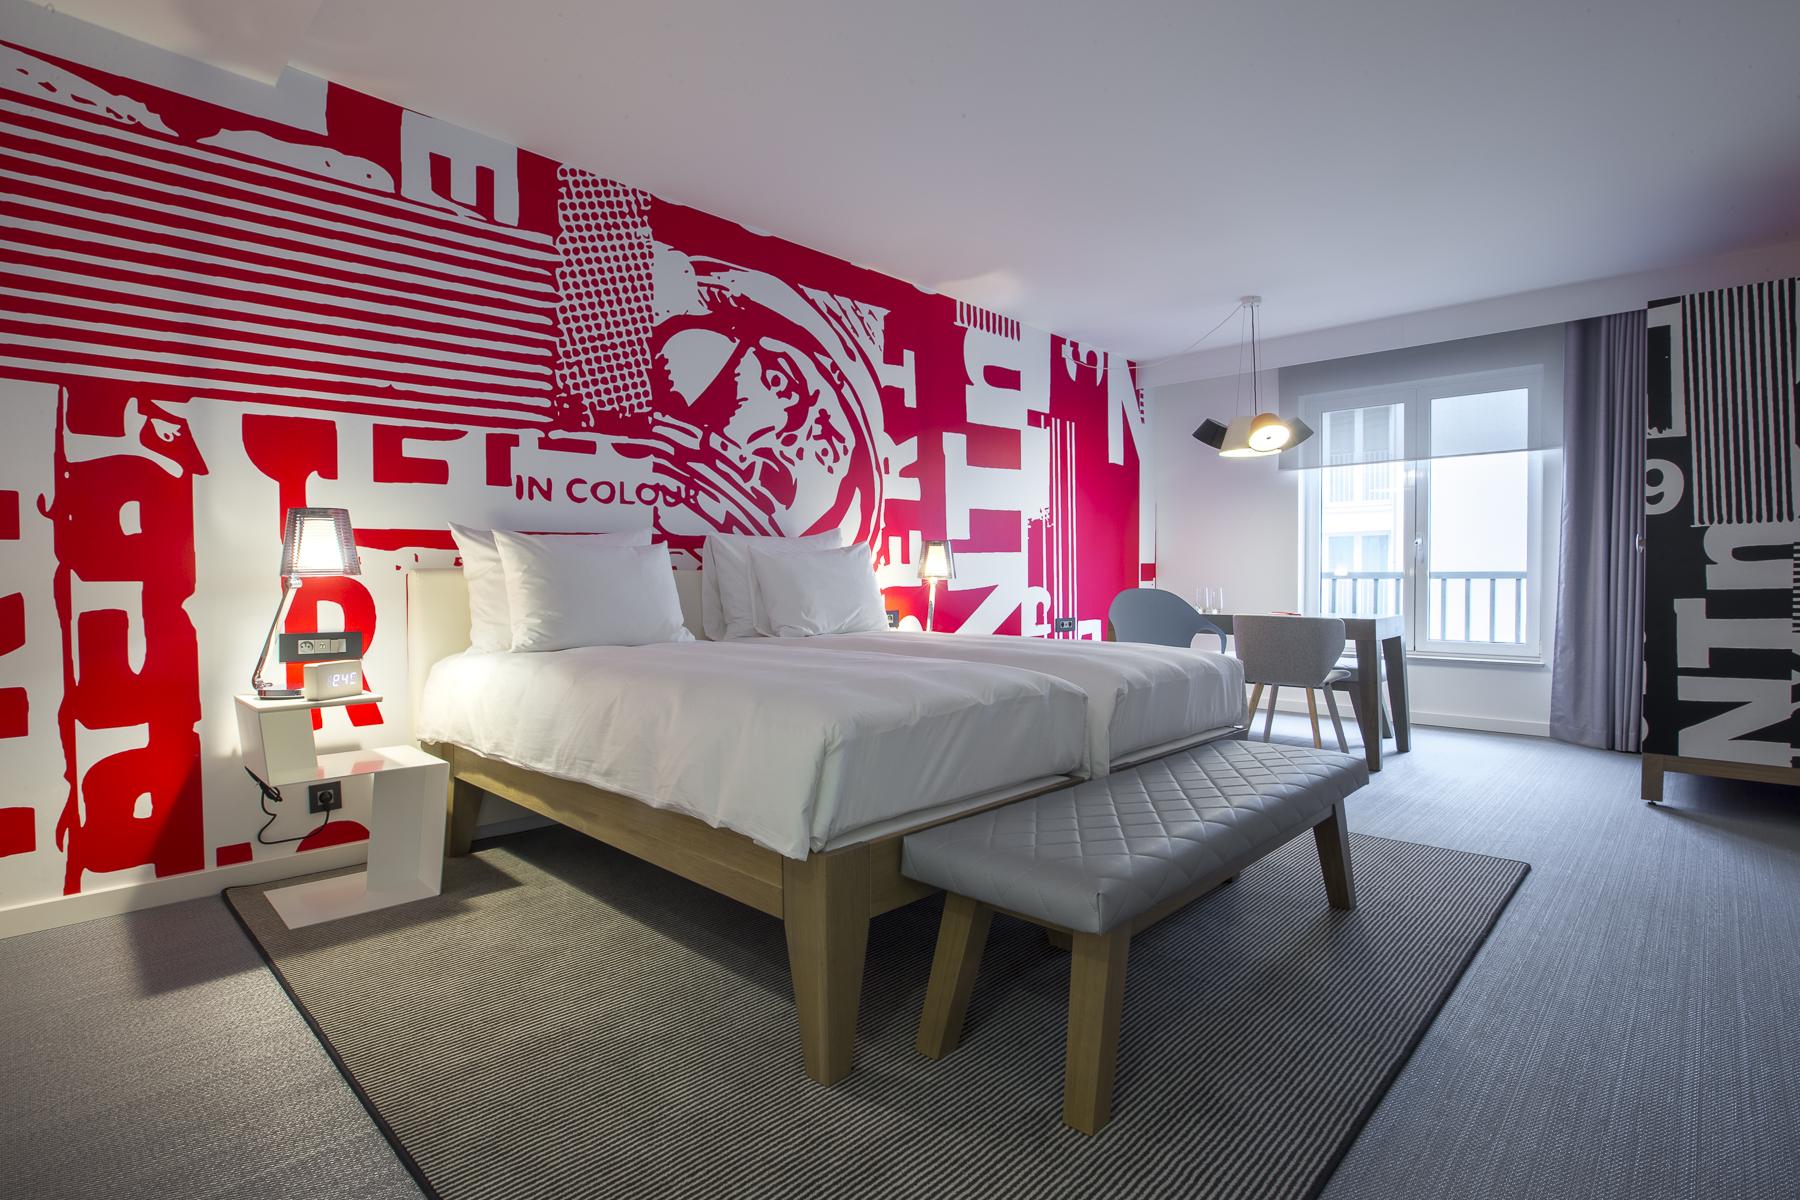 big impact will be providing wallcovering solutions for radisson red radisson blu hotels bluprint is the new interior design scheme by radisson blu